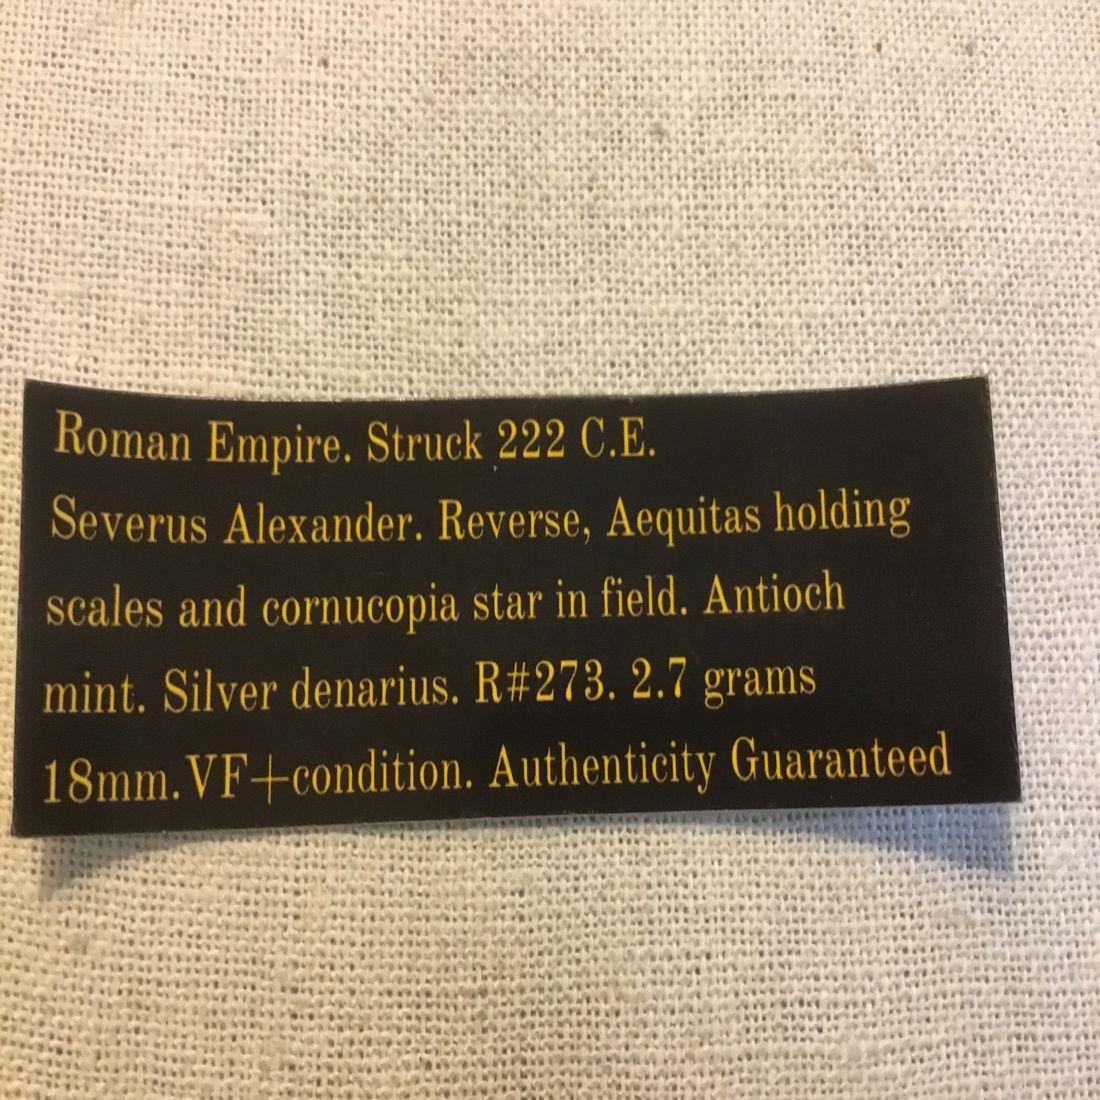 Roman Empire denarius. Severus Alexander 222 C.E. - 4